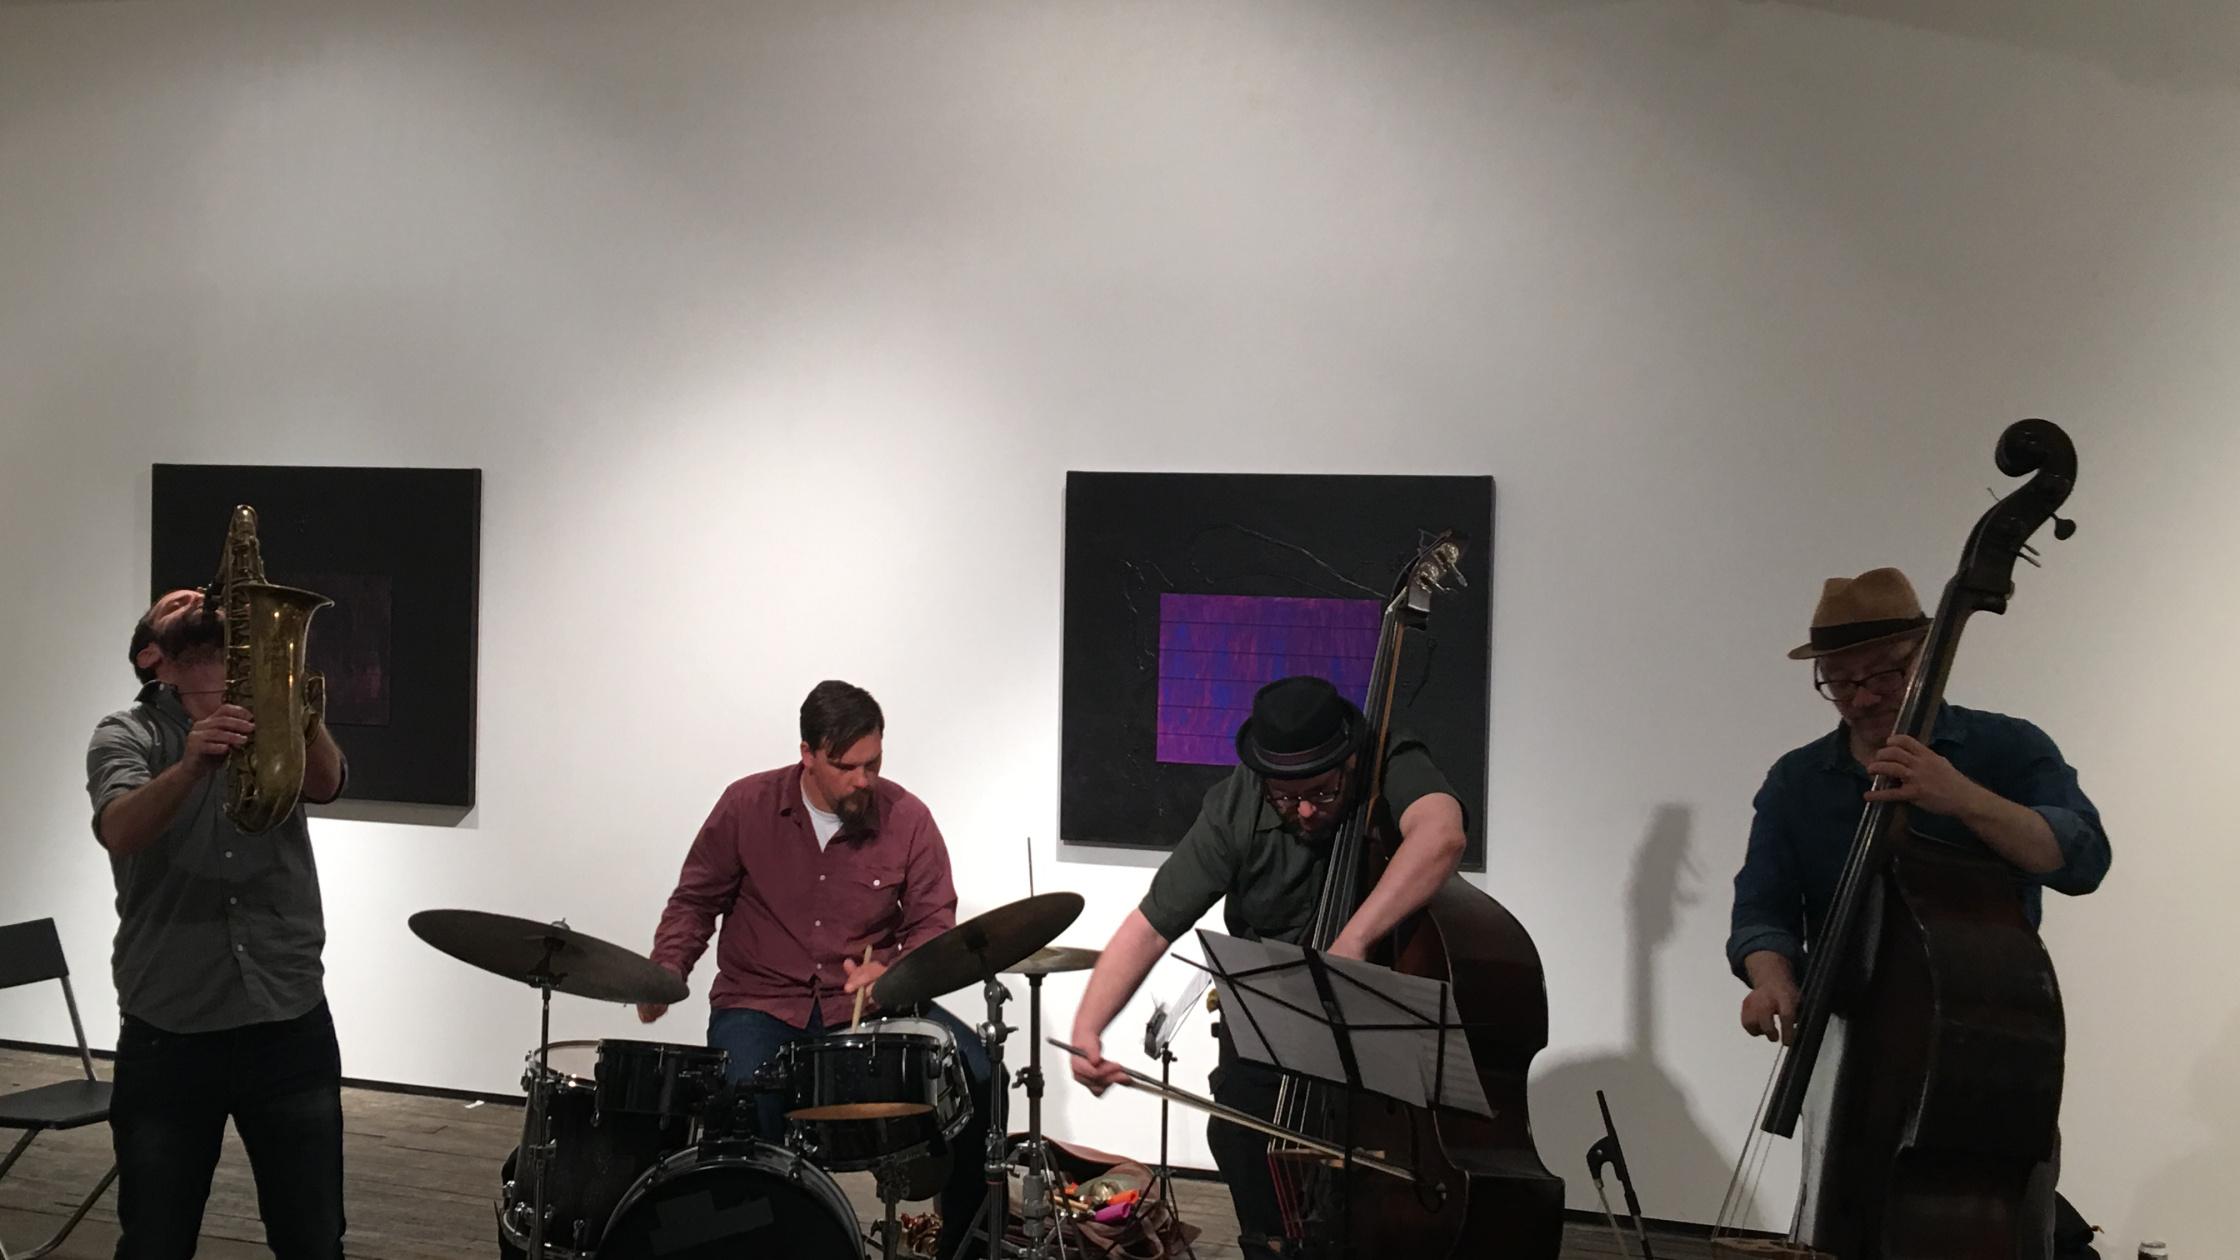 Yoni Kretzmer 2-Bass Quartet Live At The Zurcher Gallery, April 25